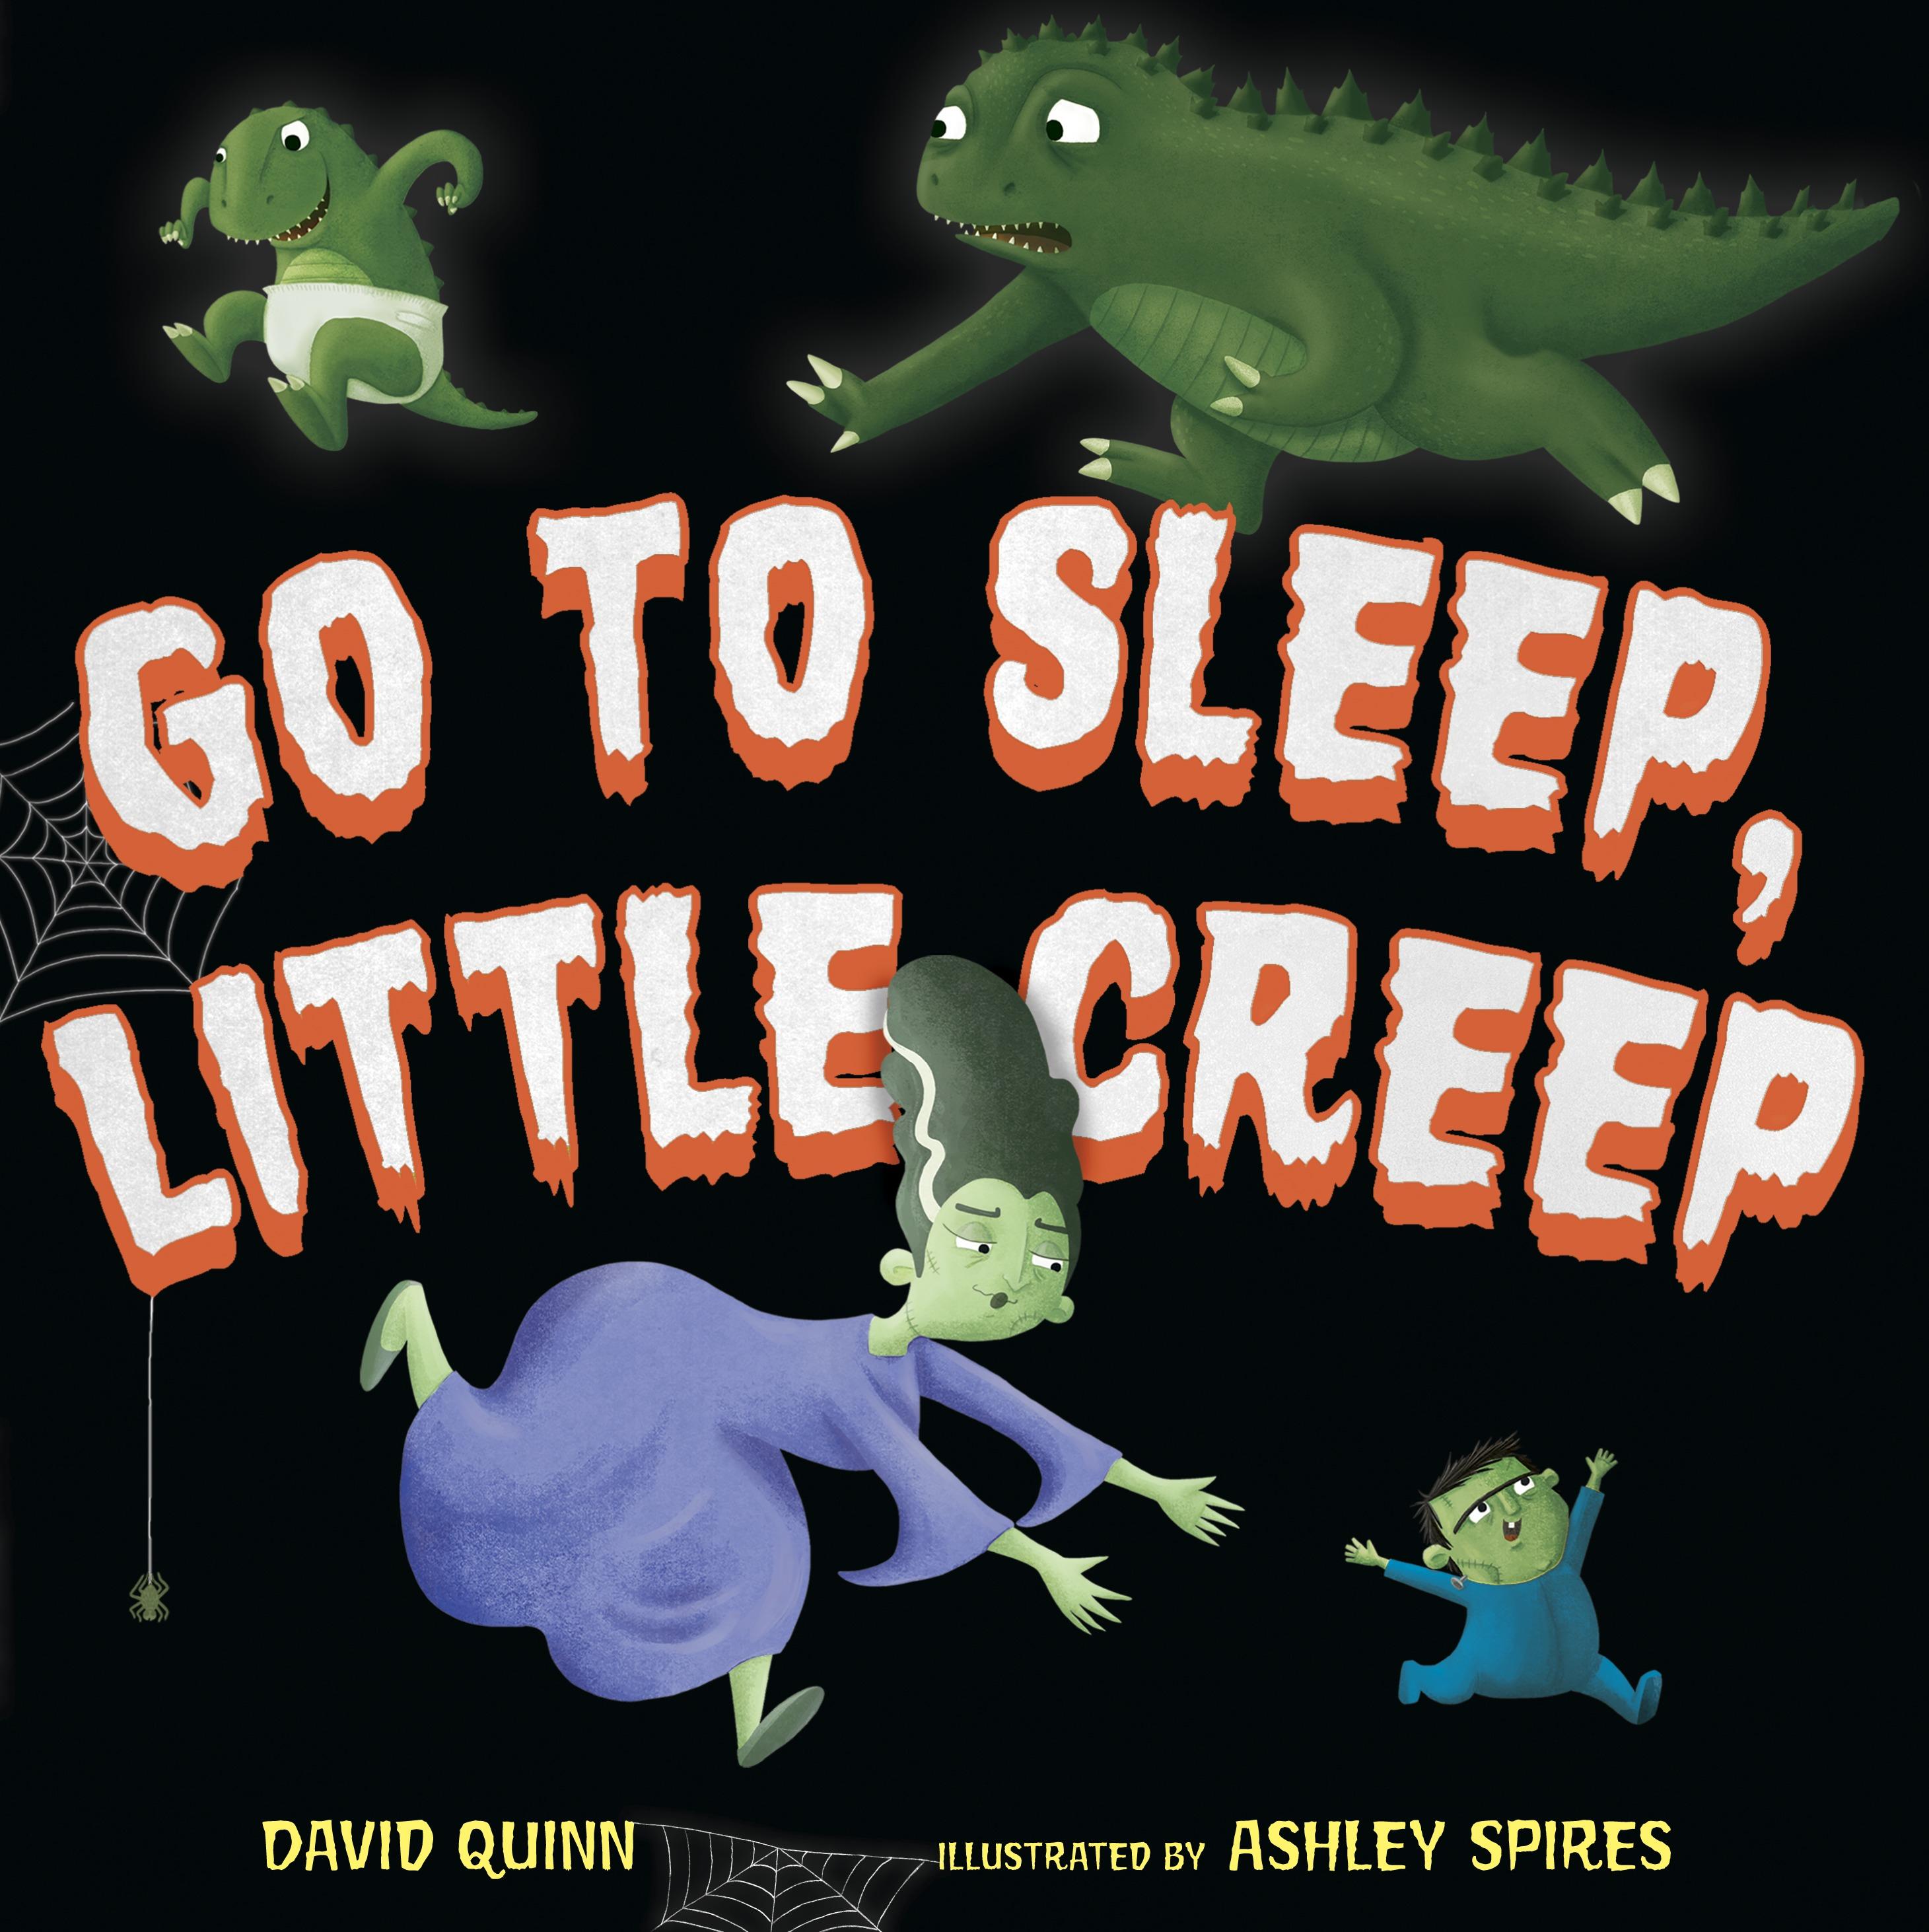 Sunday Story Time with David Quinn (Author of Go to Sleep, Little Creep)